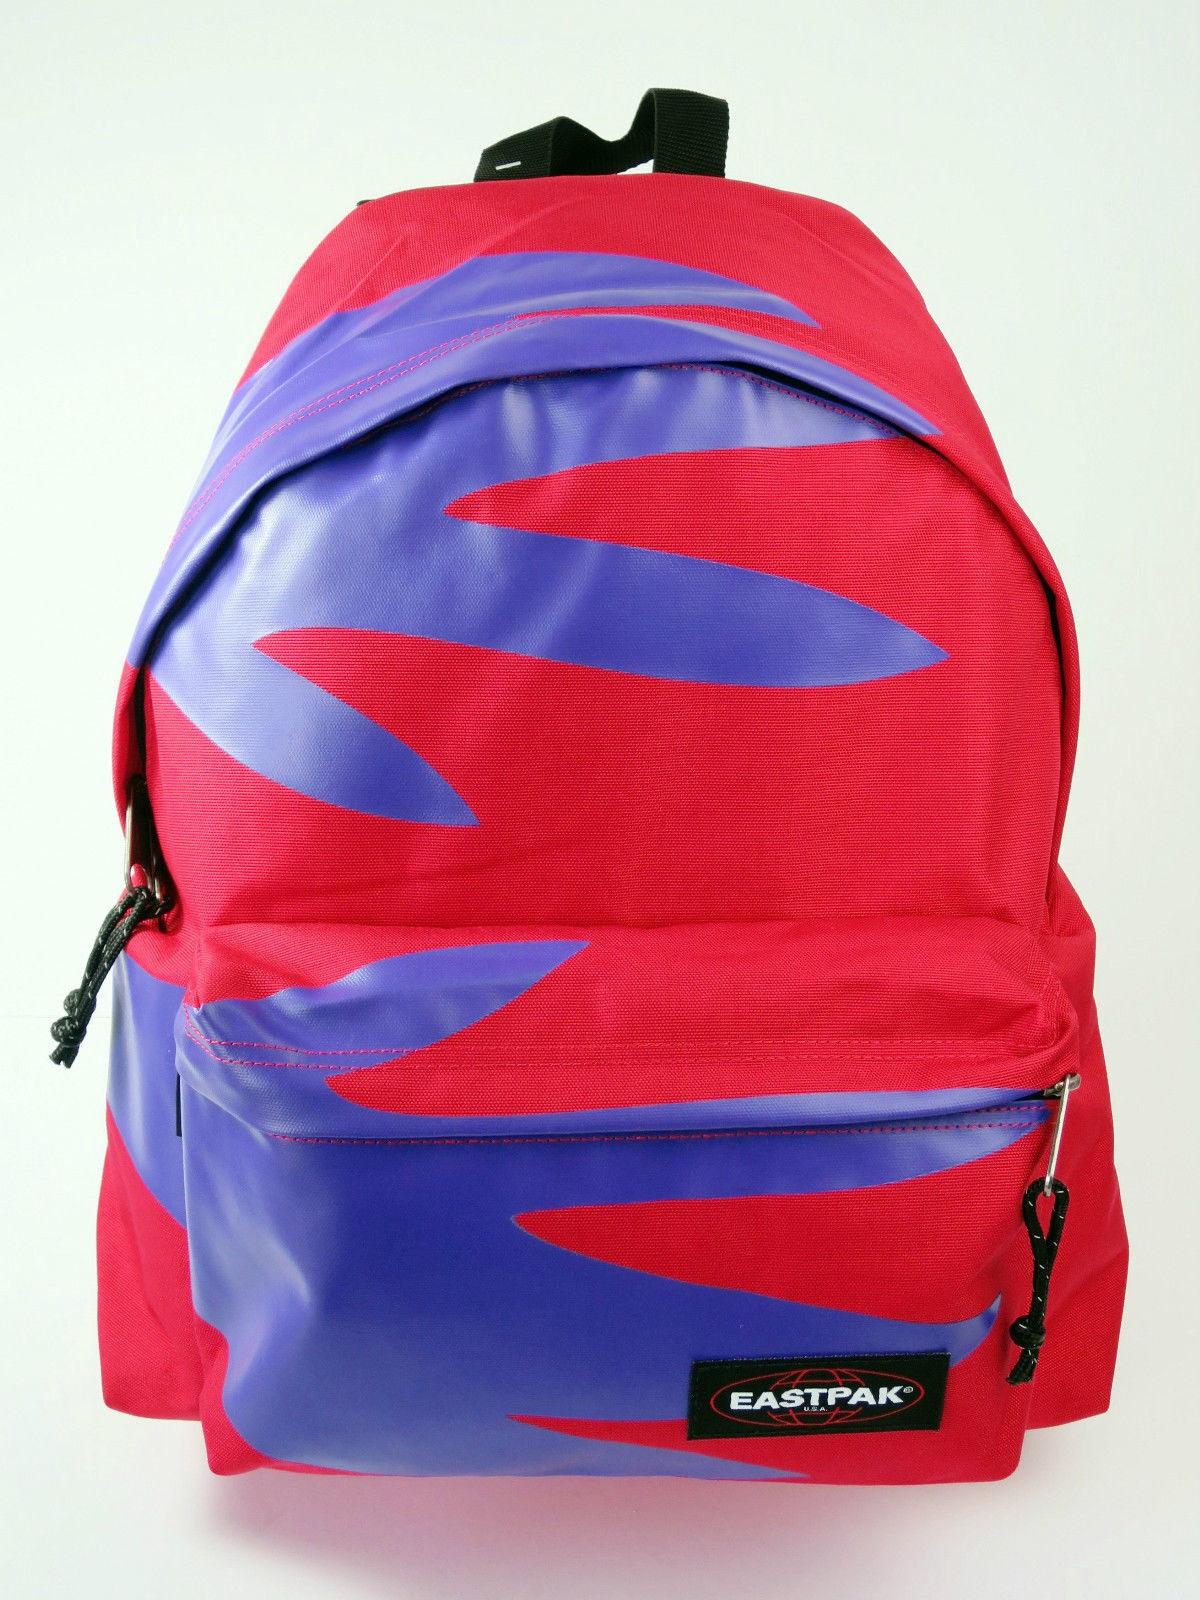 prezzo ragionevole Zaino Scuola EASTPAK EK620 PADDED PAK'R 73M Don't Don't Don't let go RED  marchio famoso